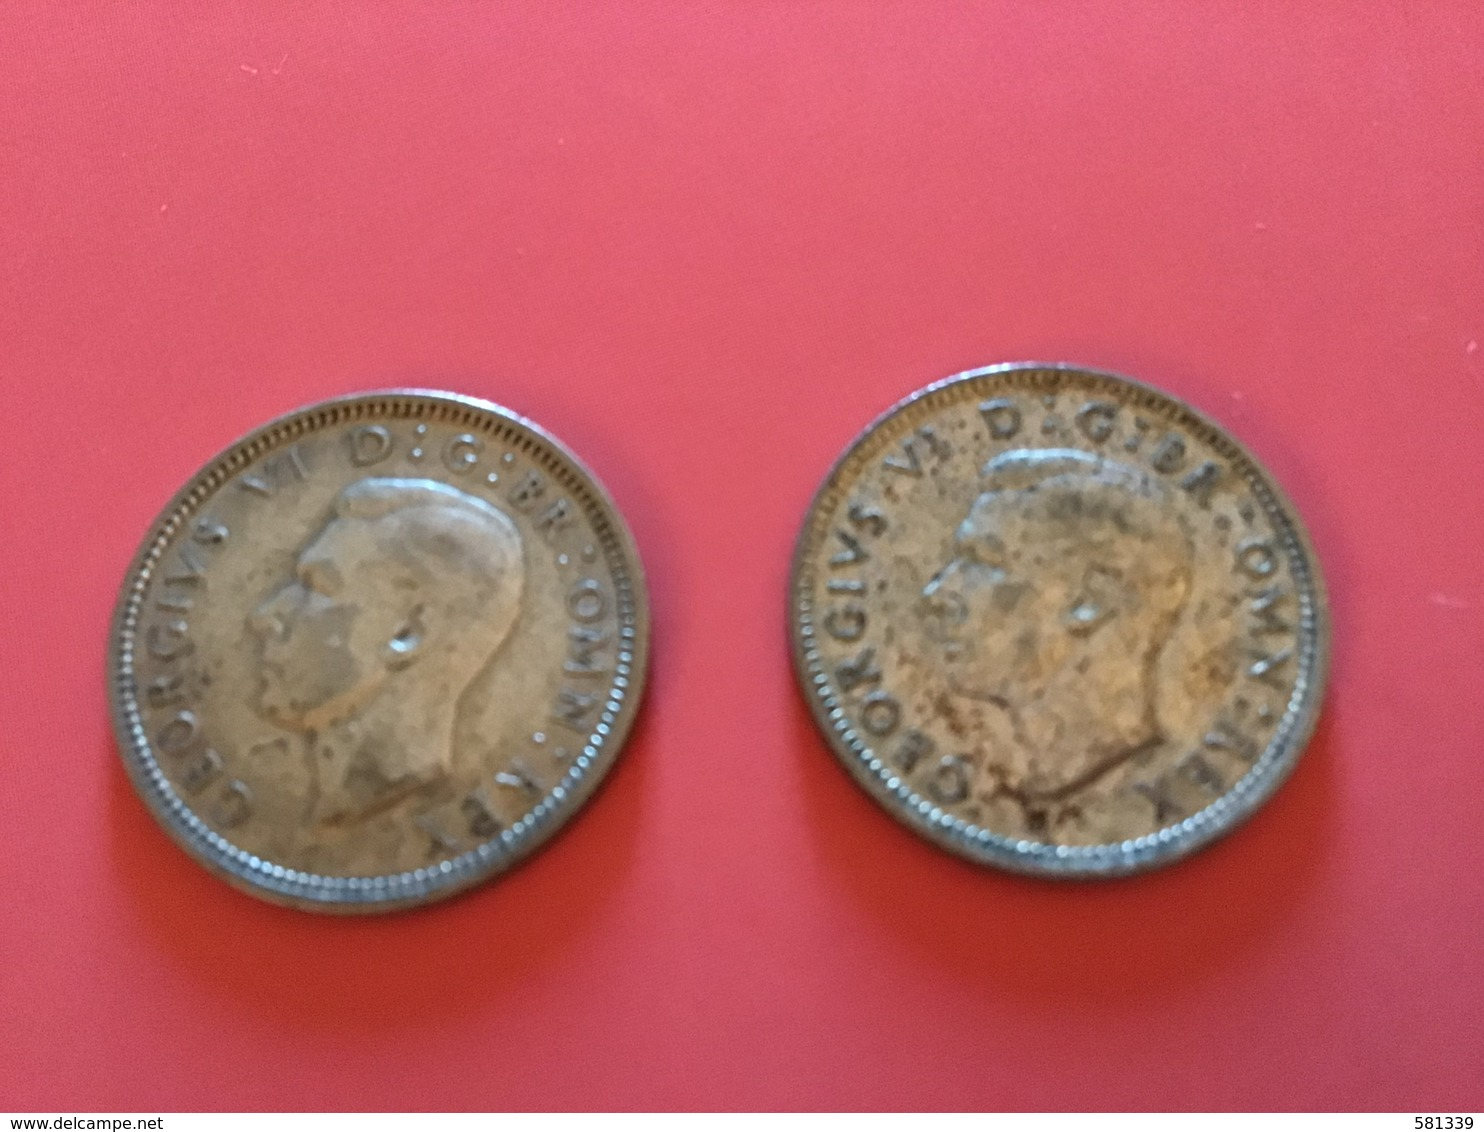 GRAN BRETAGNA  - 1939 E 1945 - 2  Monete Da 6 PENCE - Giorgio V - Altri